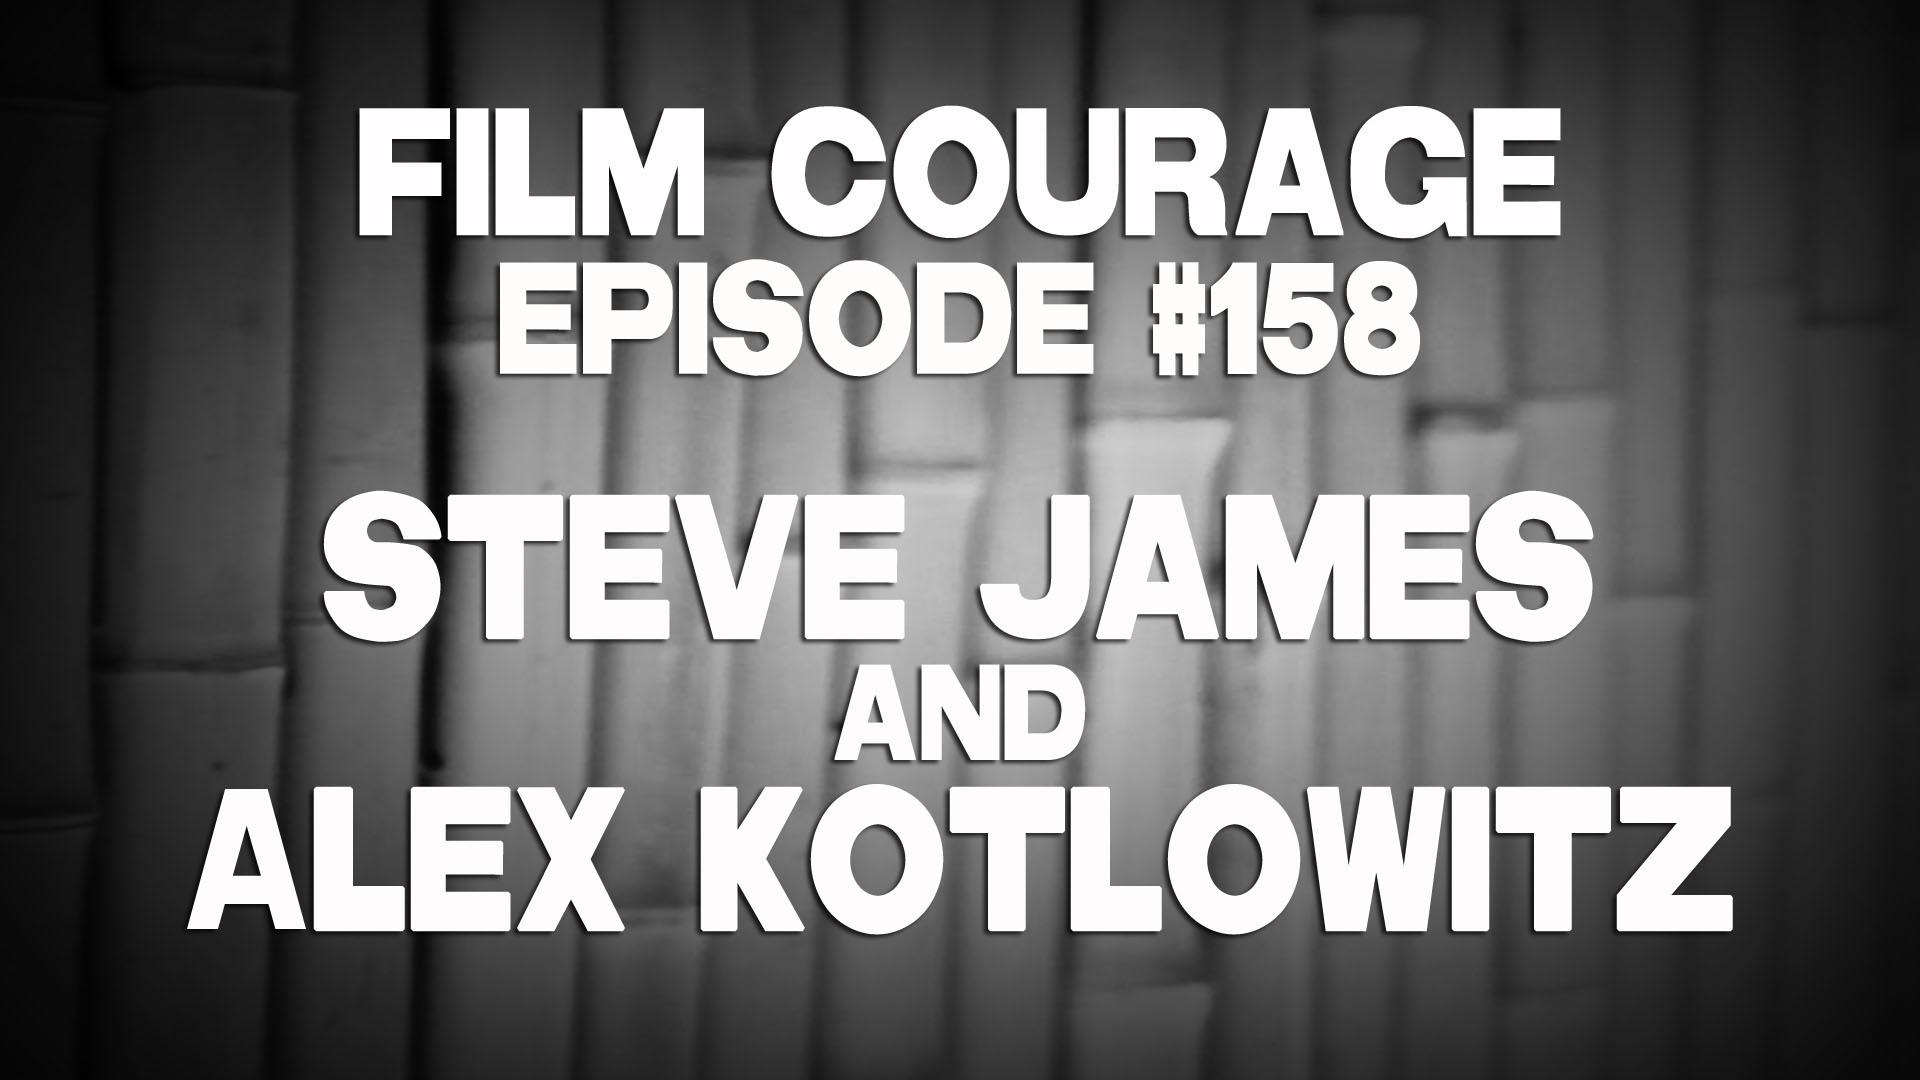 Film Courage #158 Steve James & Alex Kotlowitz